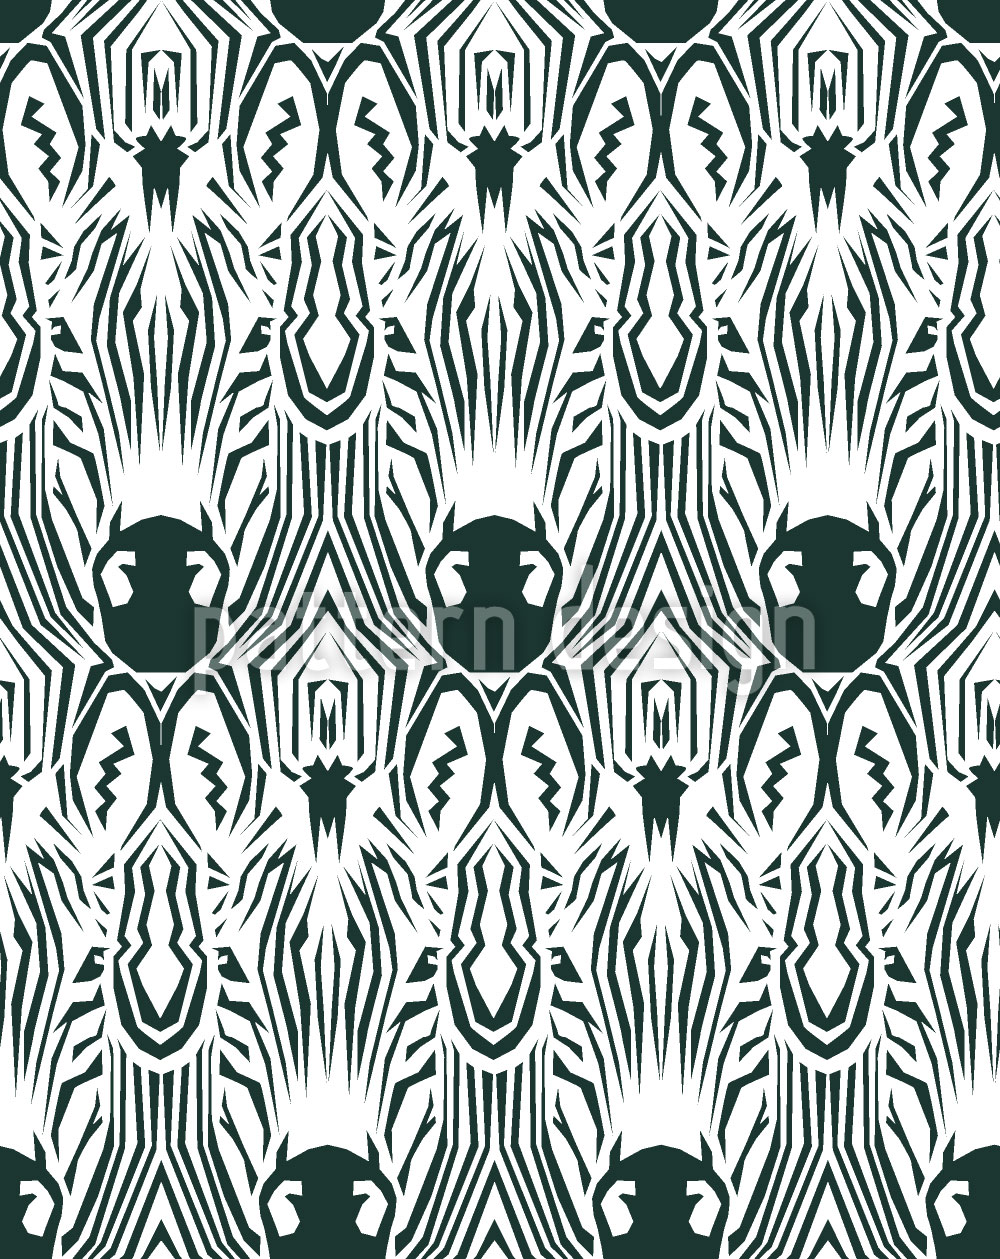 Designtapete Zebra Kaleidoskop